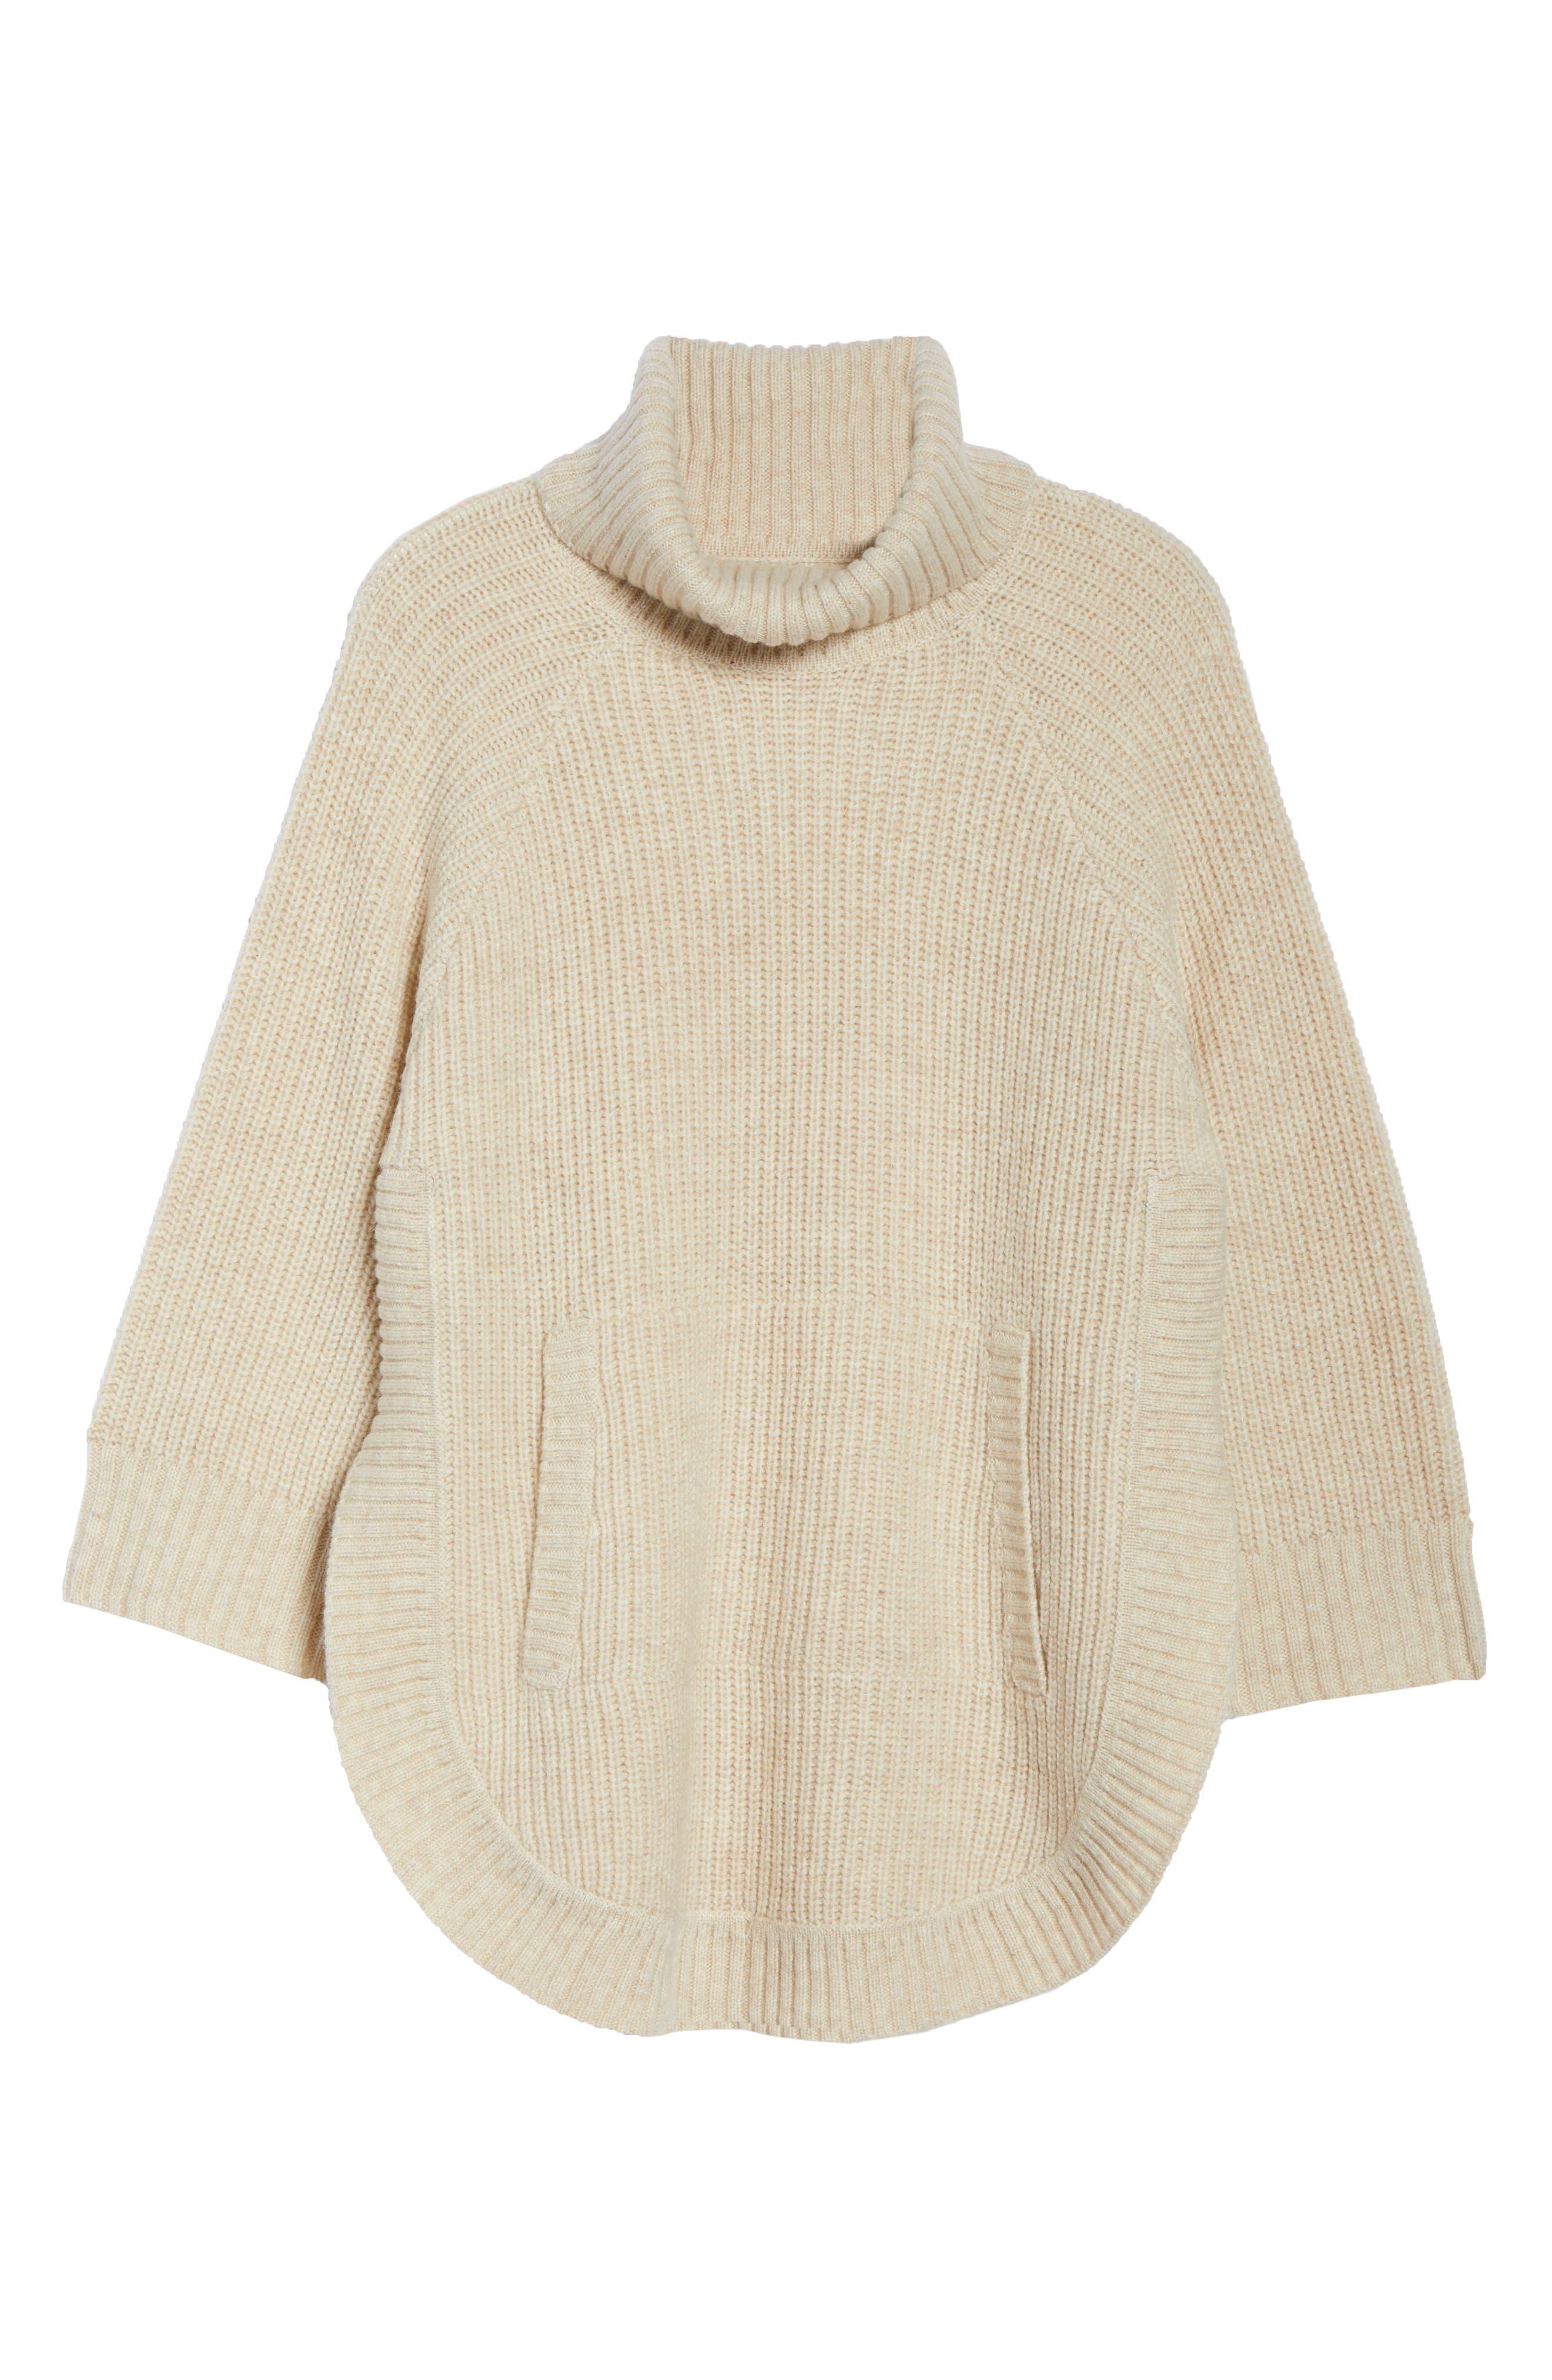 Raelynn Sweater Poncho,                             Alternate thumbnail 6, color,                             CREAM HEATHER